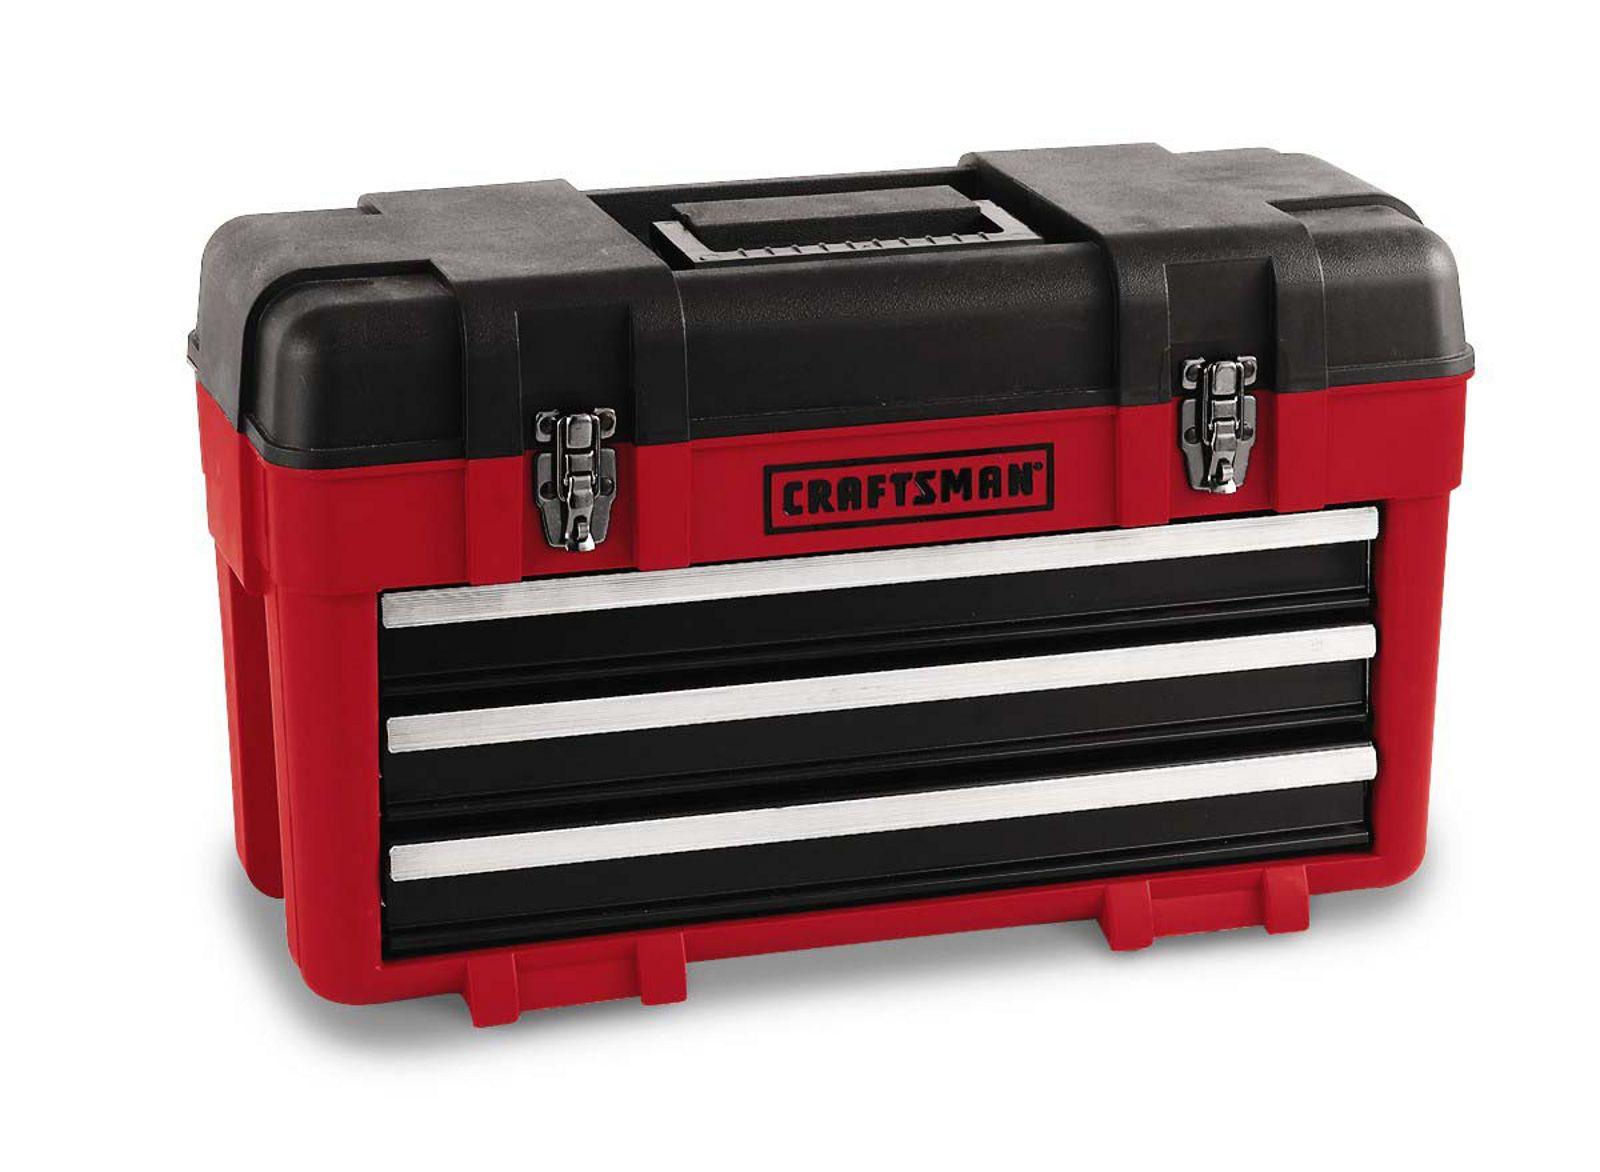 craftsman 3 drawer plastic metal toolbox | giving | Tool